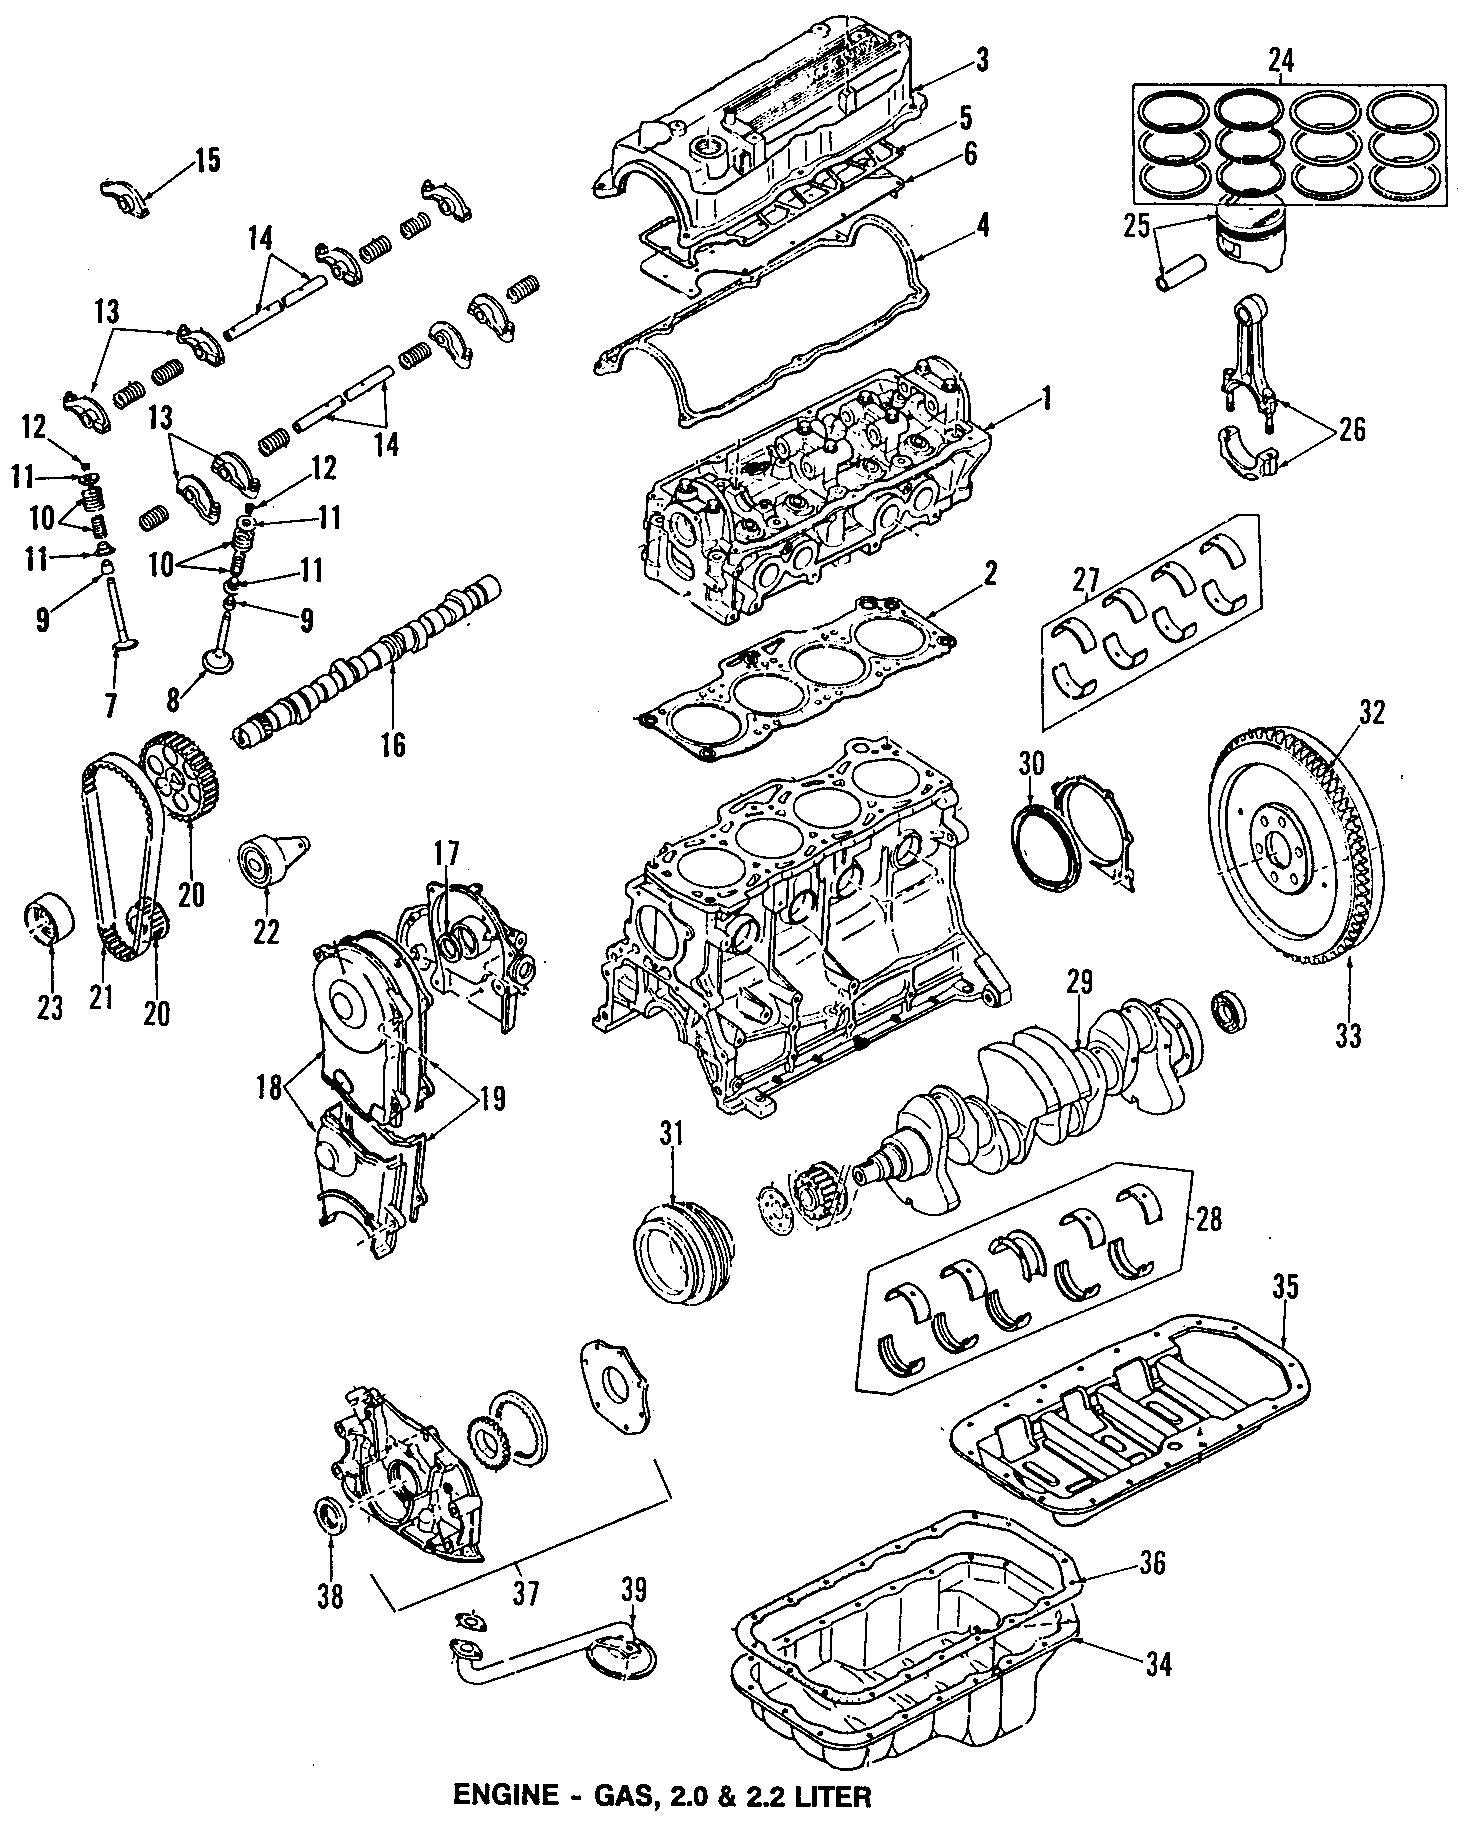 1985 Mazda RX-7 Bearing set. Metal set, connector. Rod